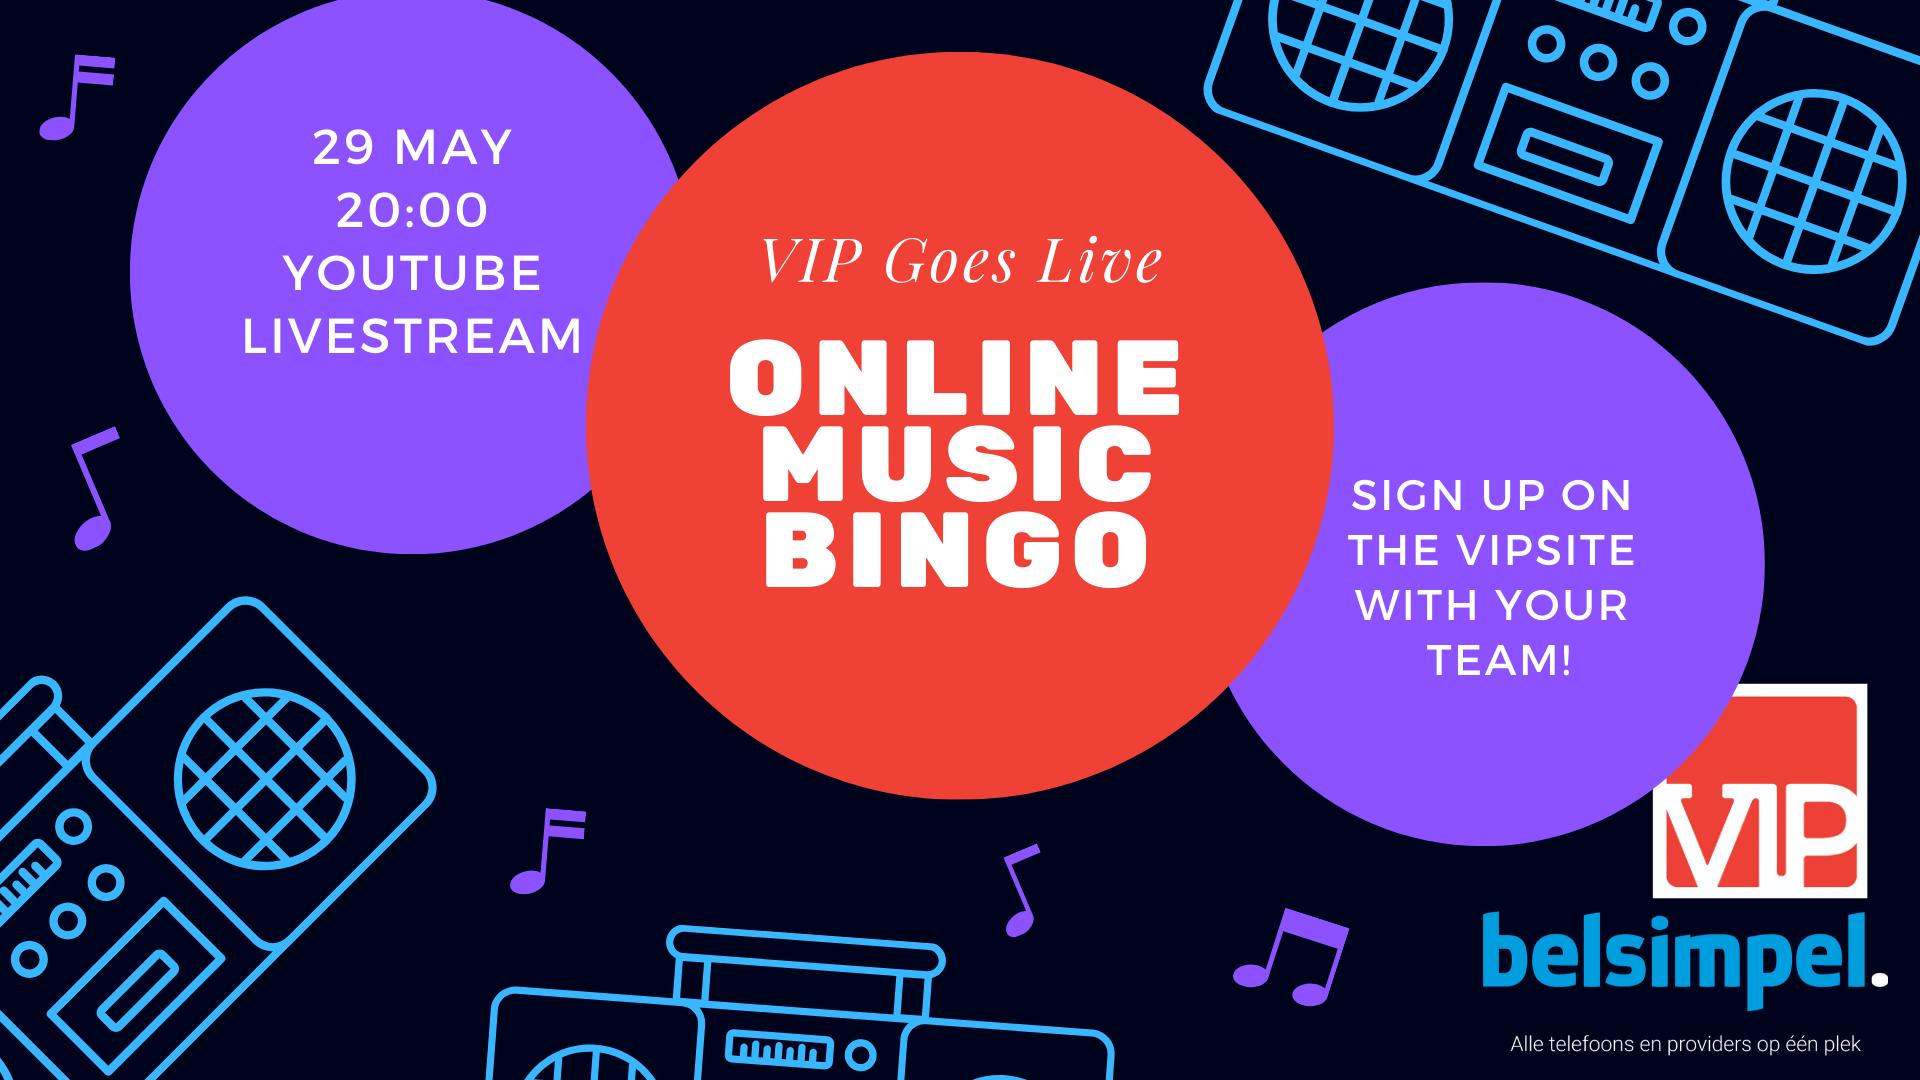 VIP goes live: Online Music Bingo